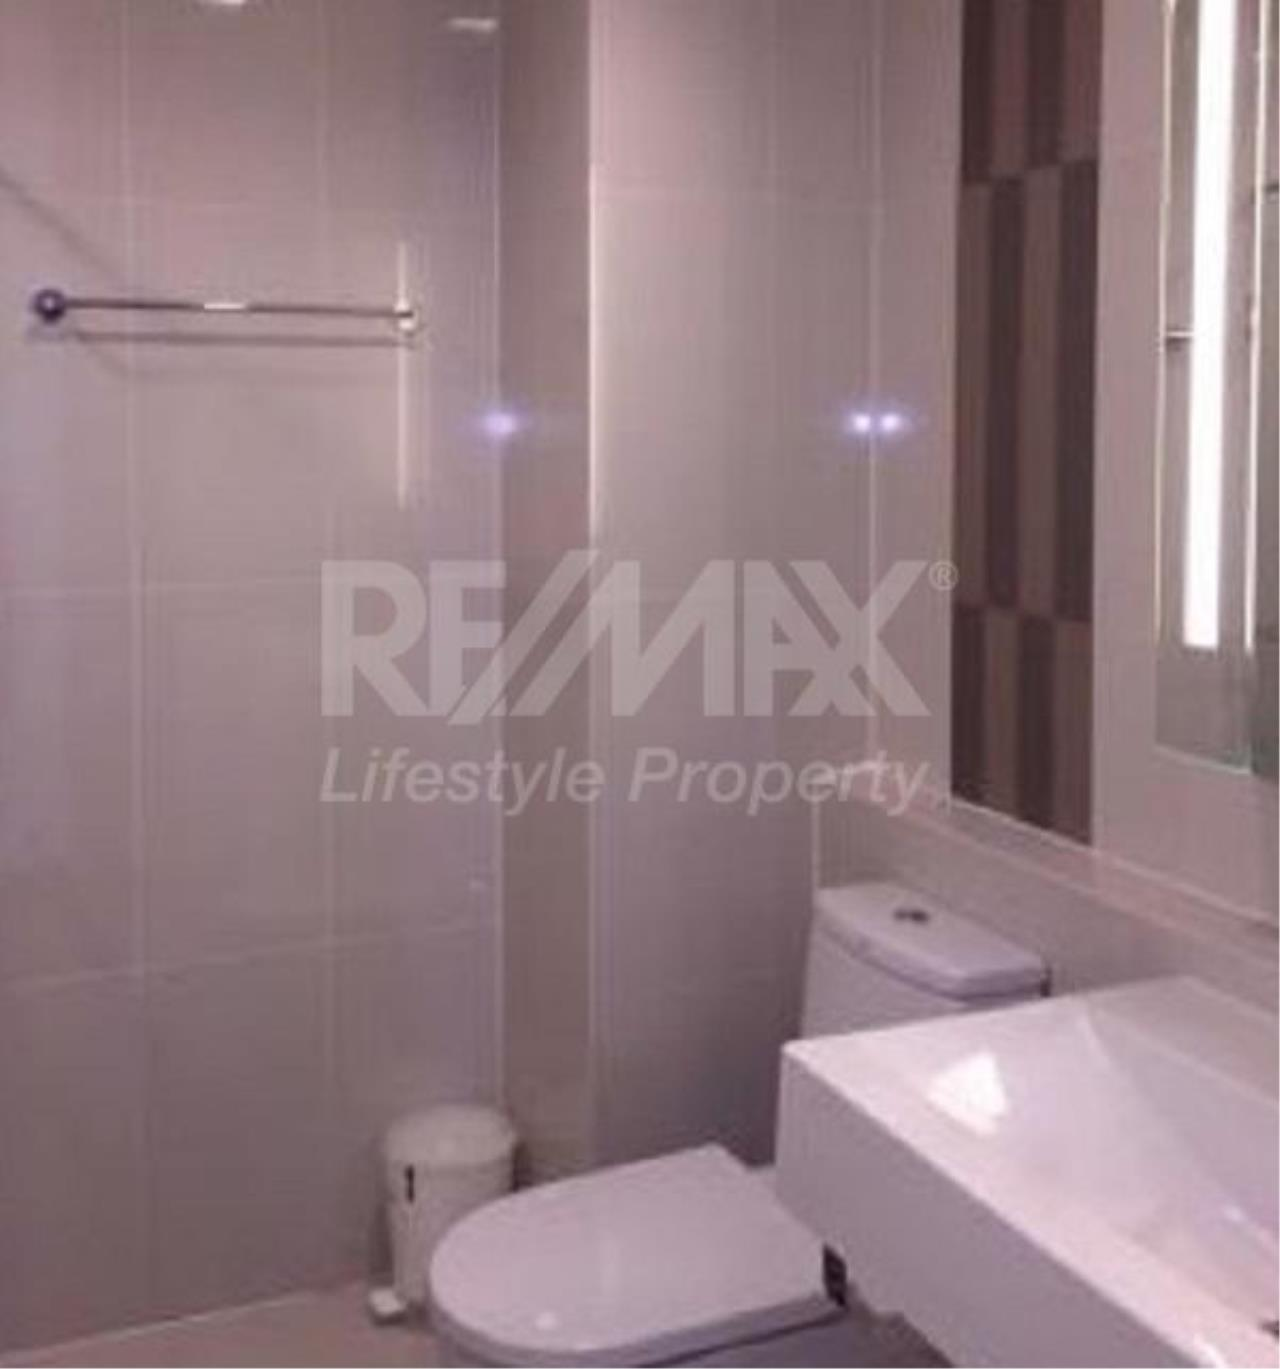 RE/MAX LifeStyle Property Agency's Q House Sukhumvit 79 7